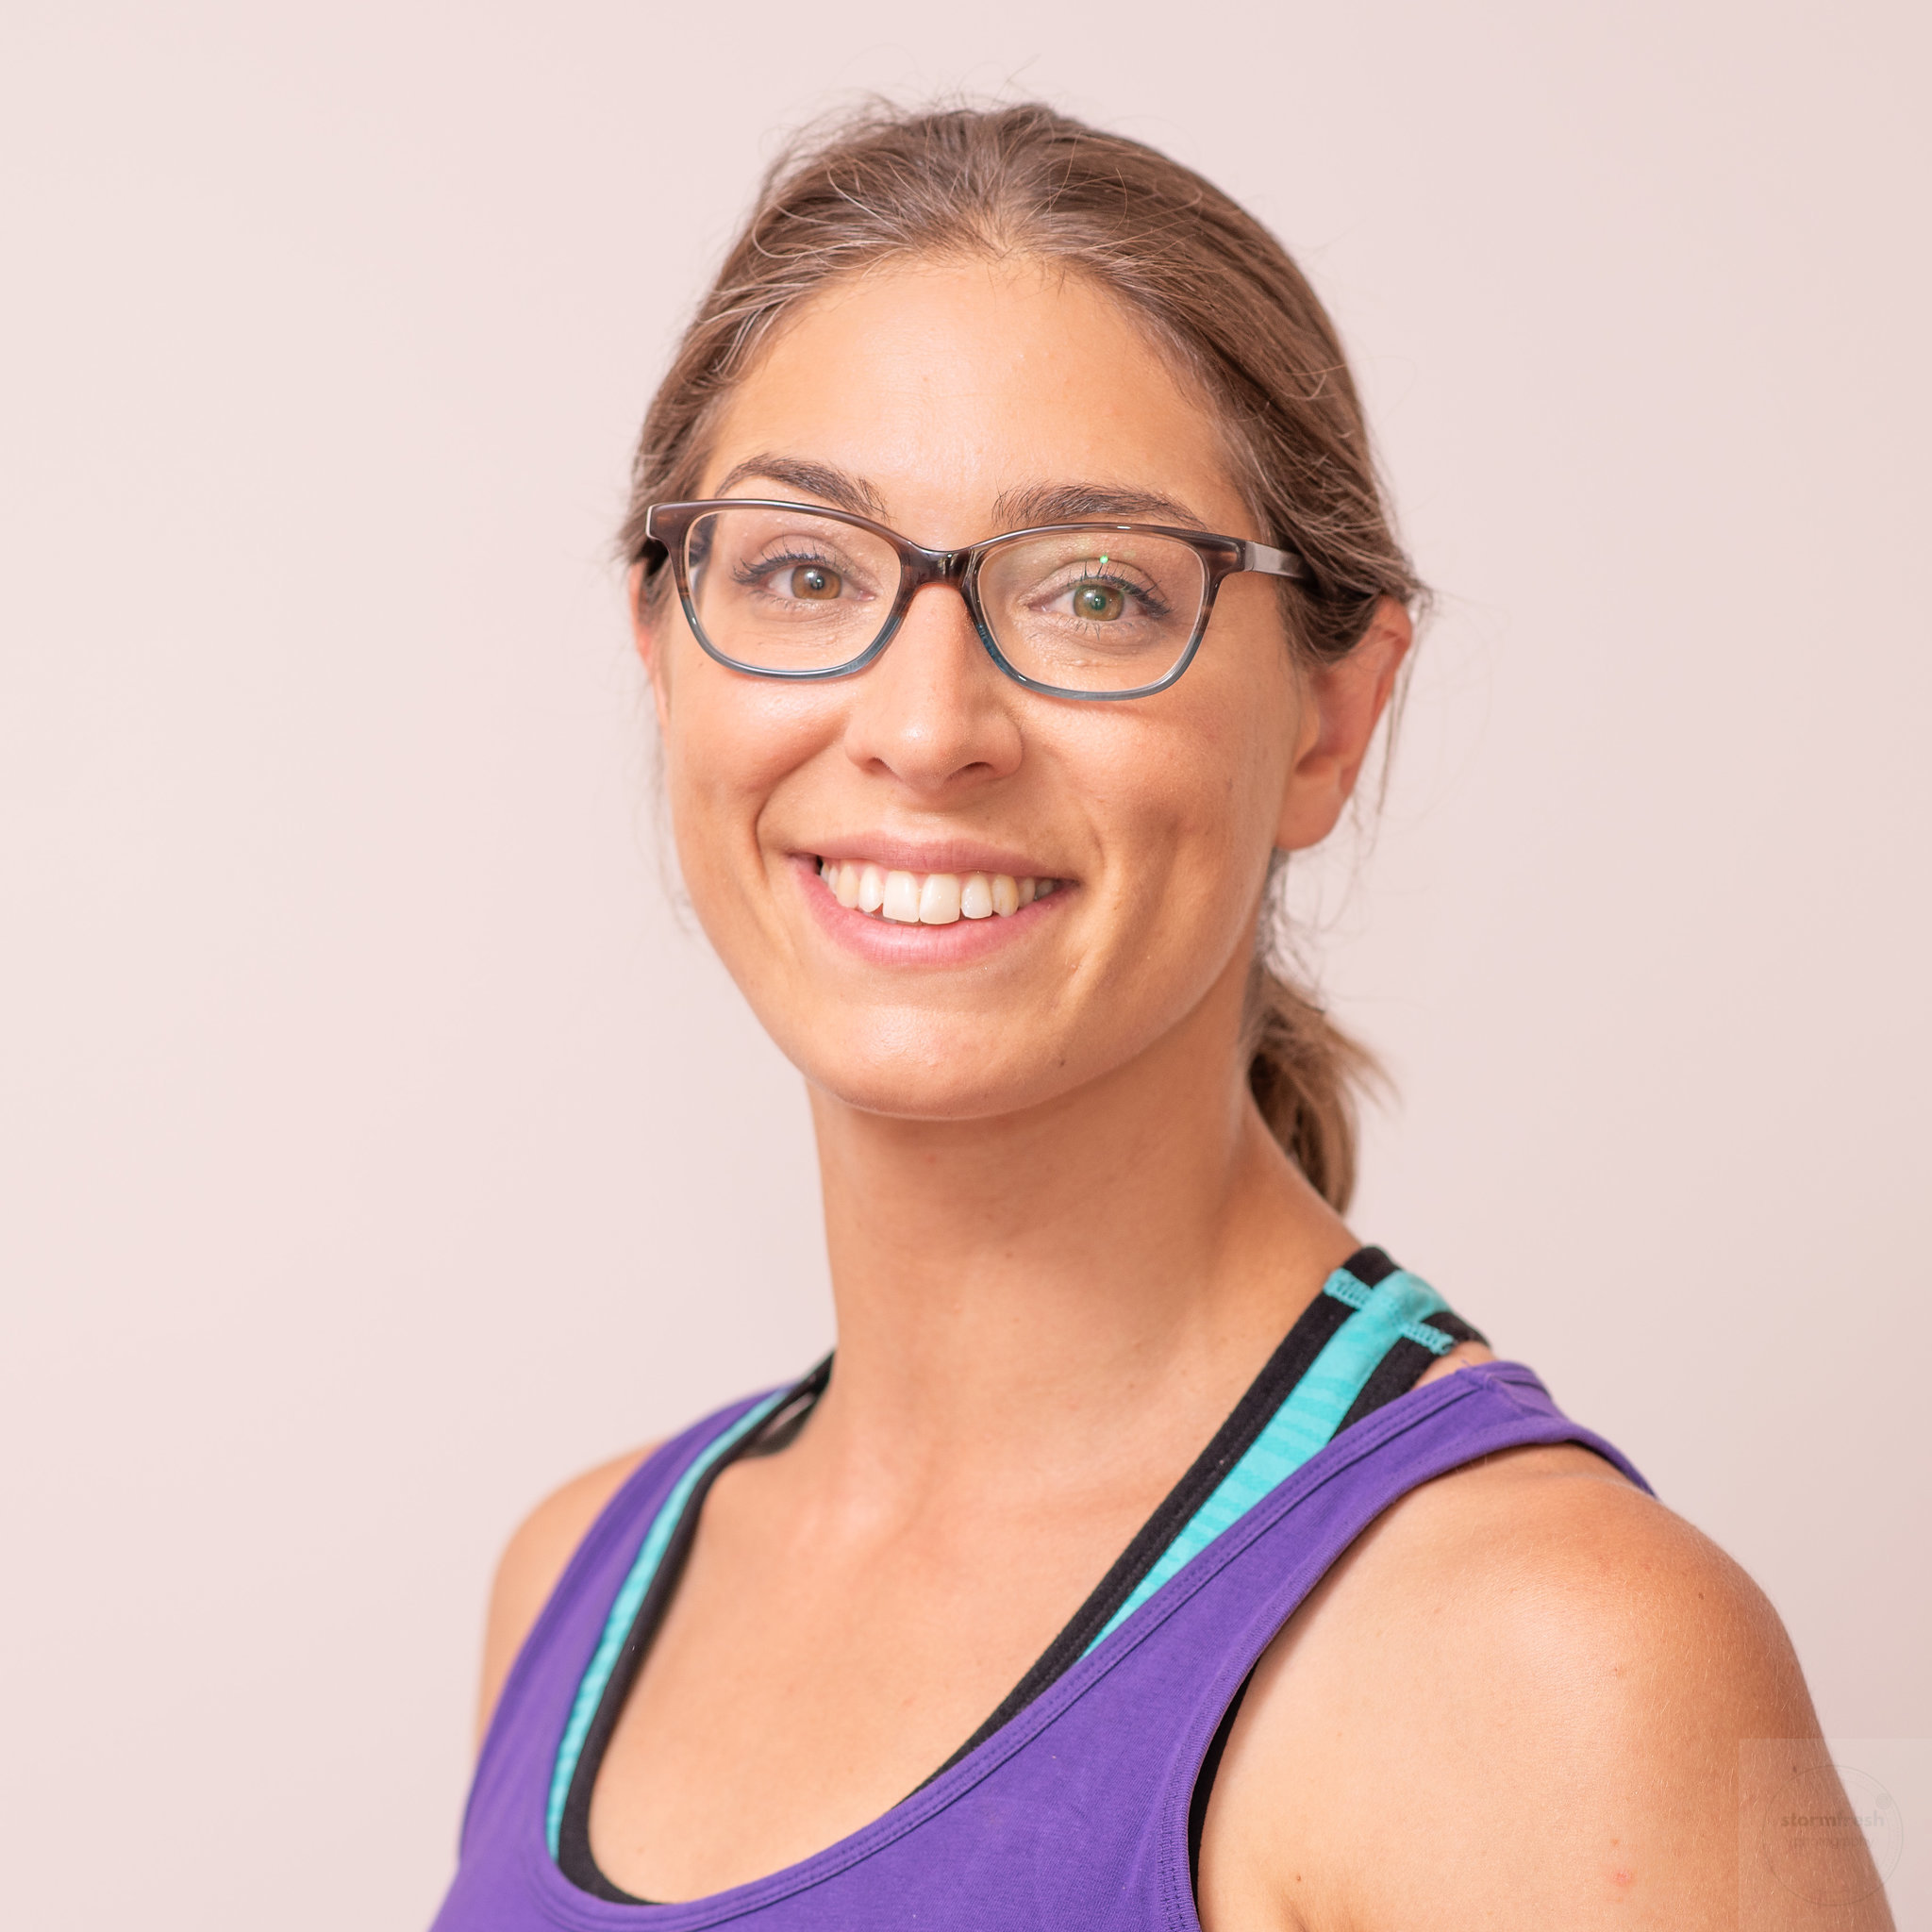 Portrait picture of Rachel Changer